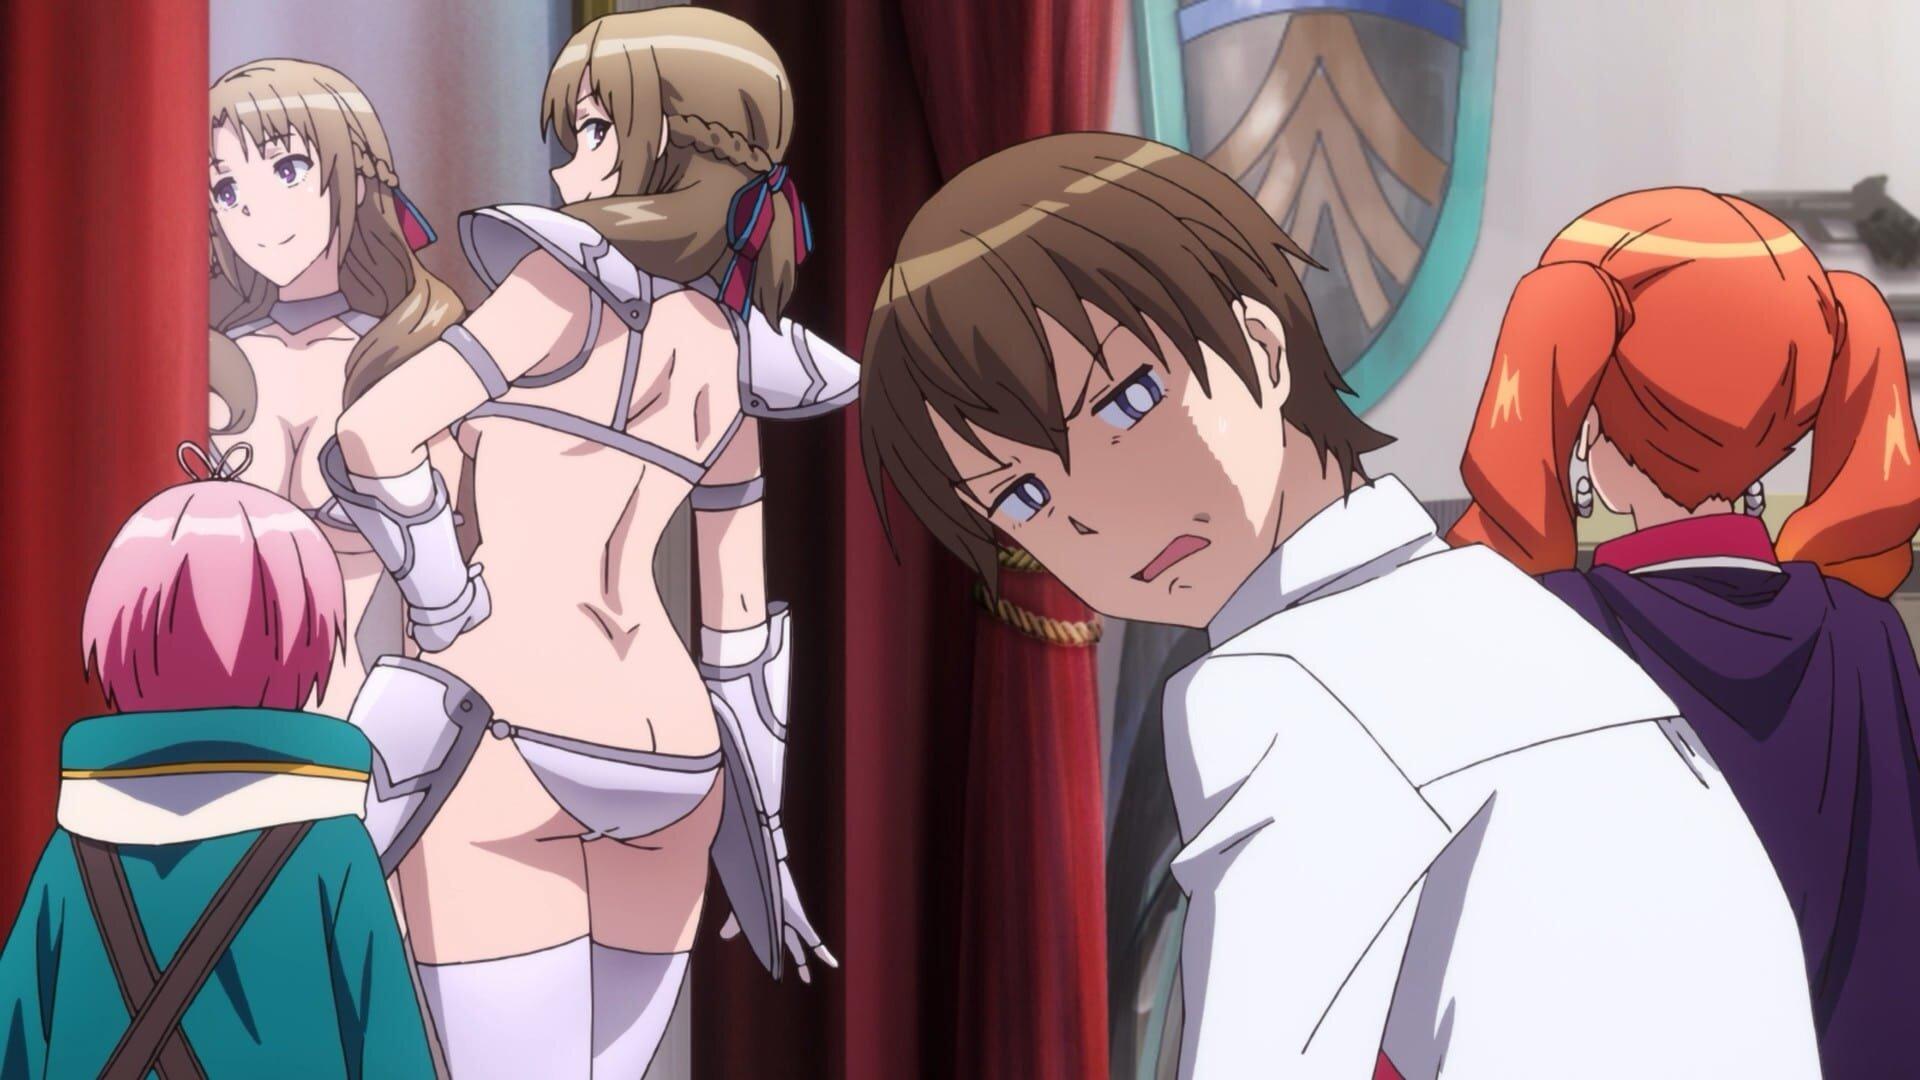 Forced vibrator anime